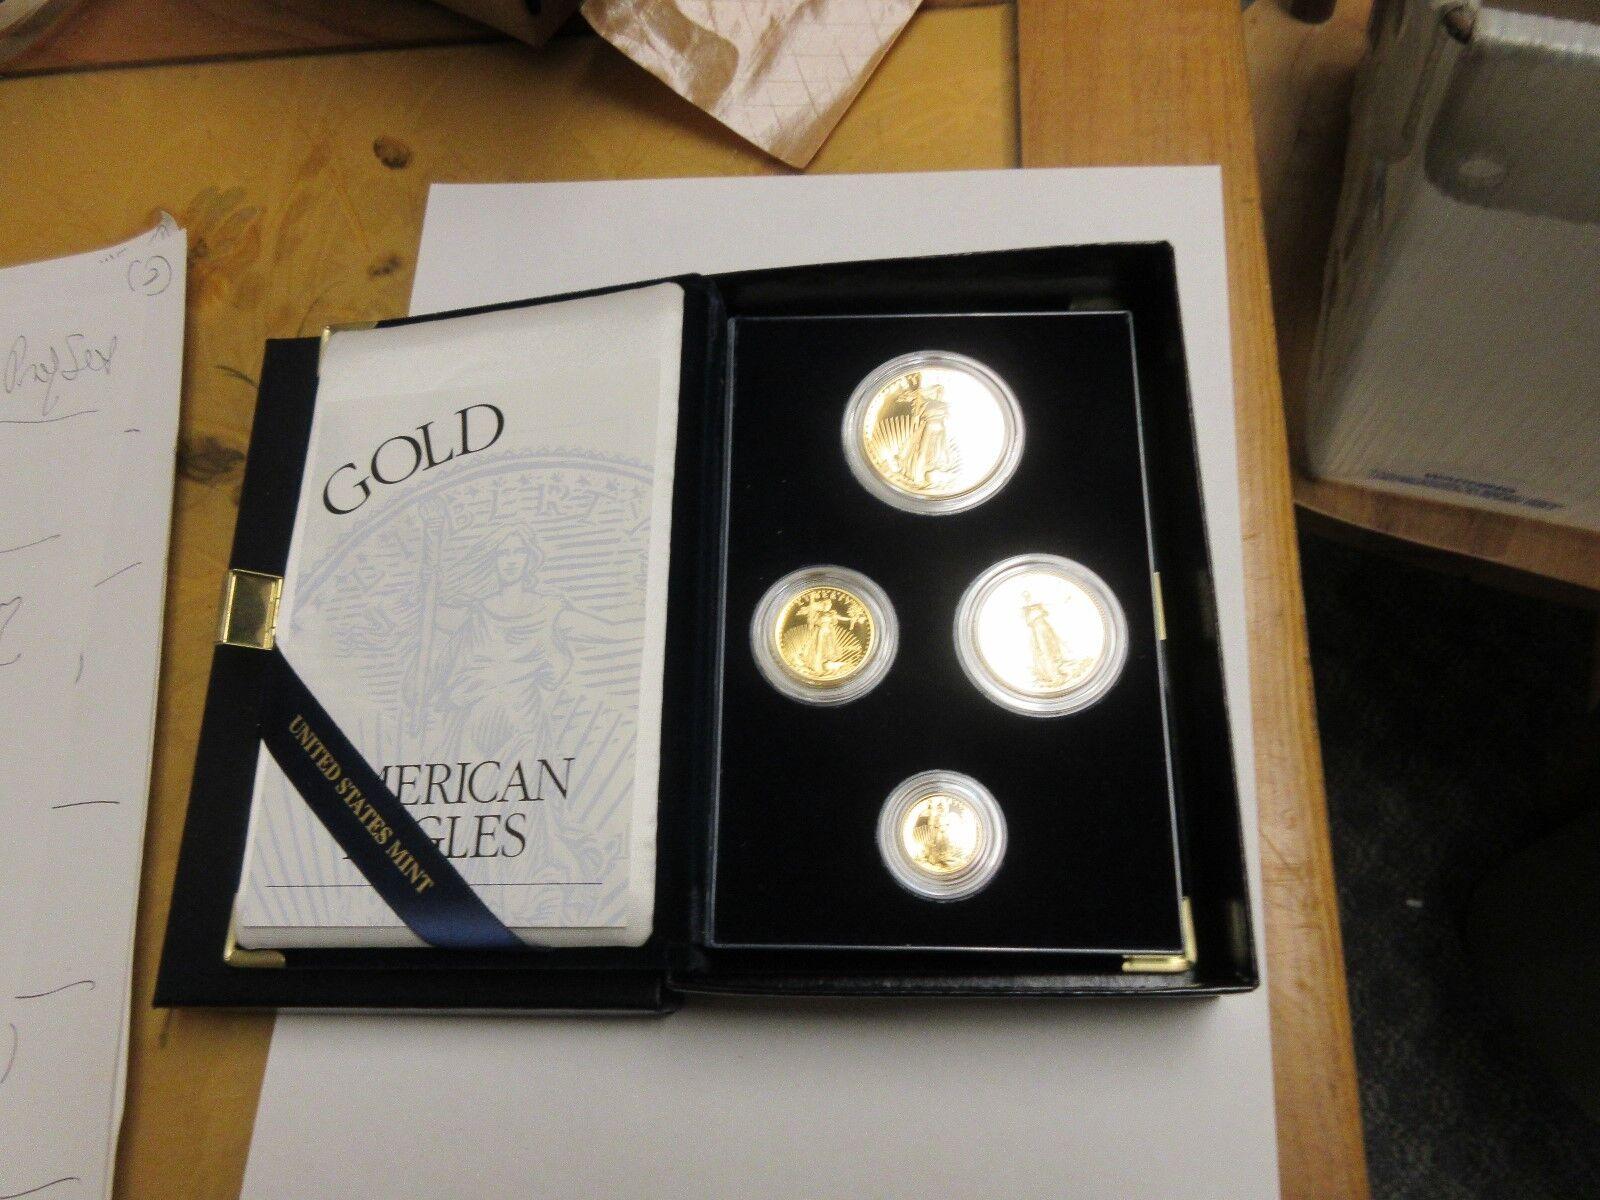 1997 American Eagle Gold Proof Set